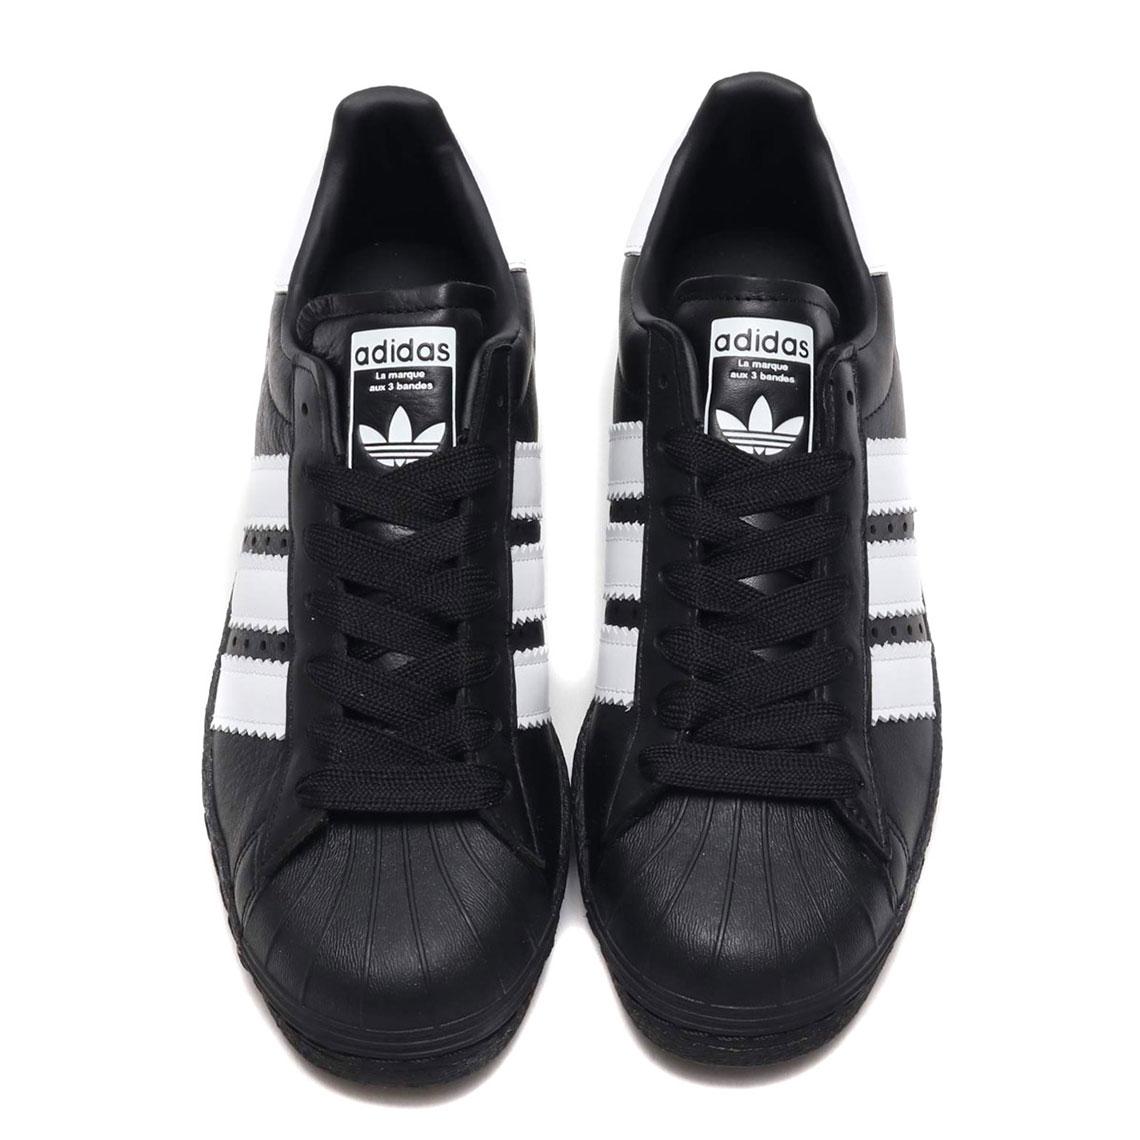 Adidas Superstar 80s Core BlackFootwear White BD7363